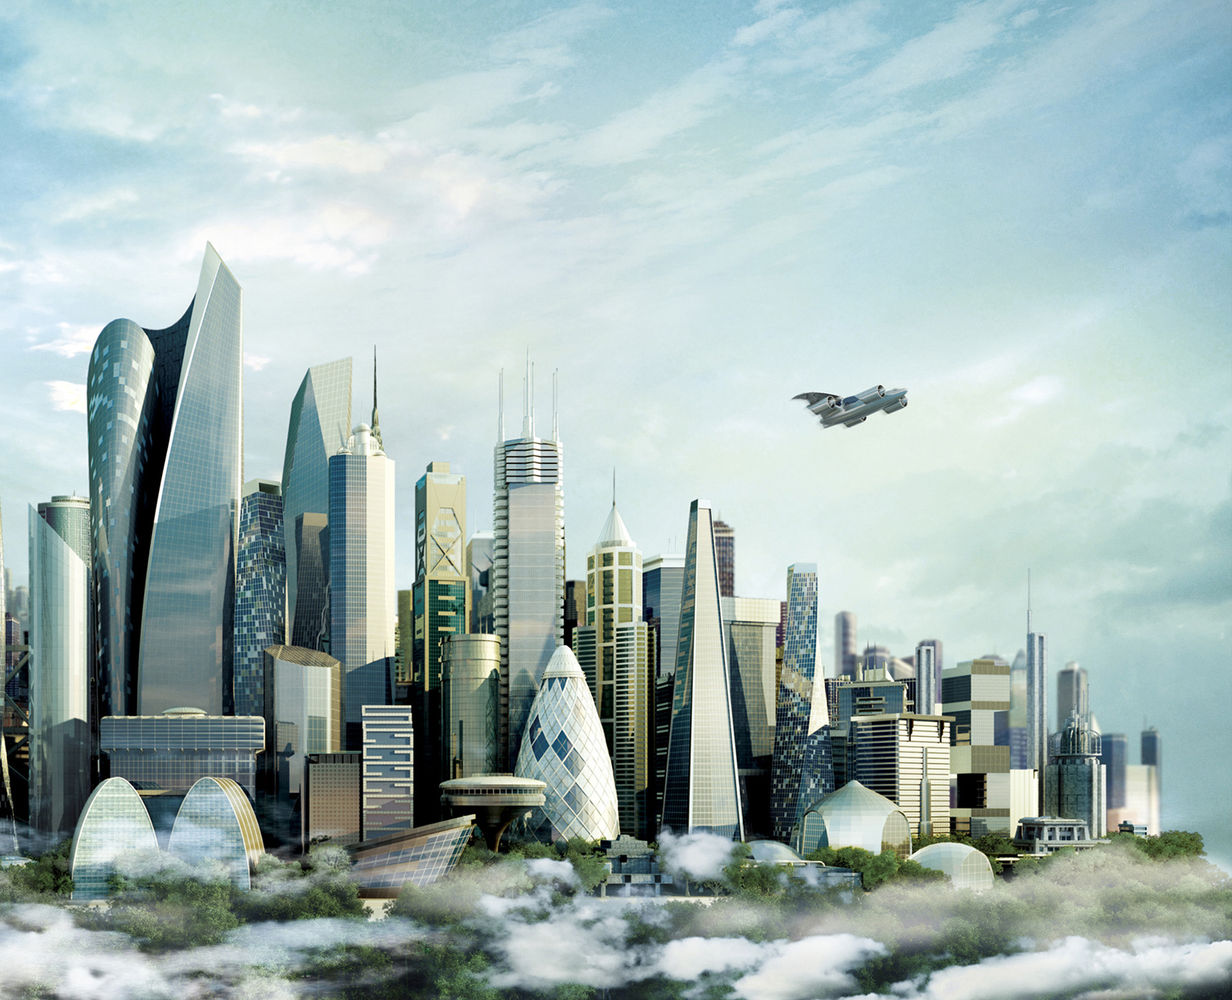 Samsung City 3